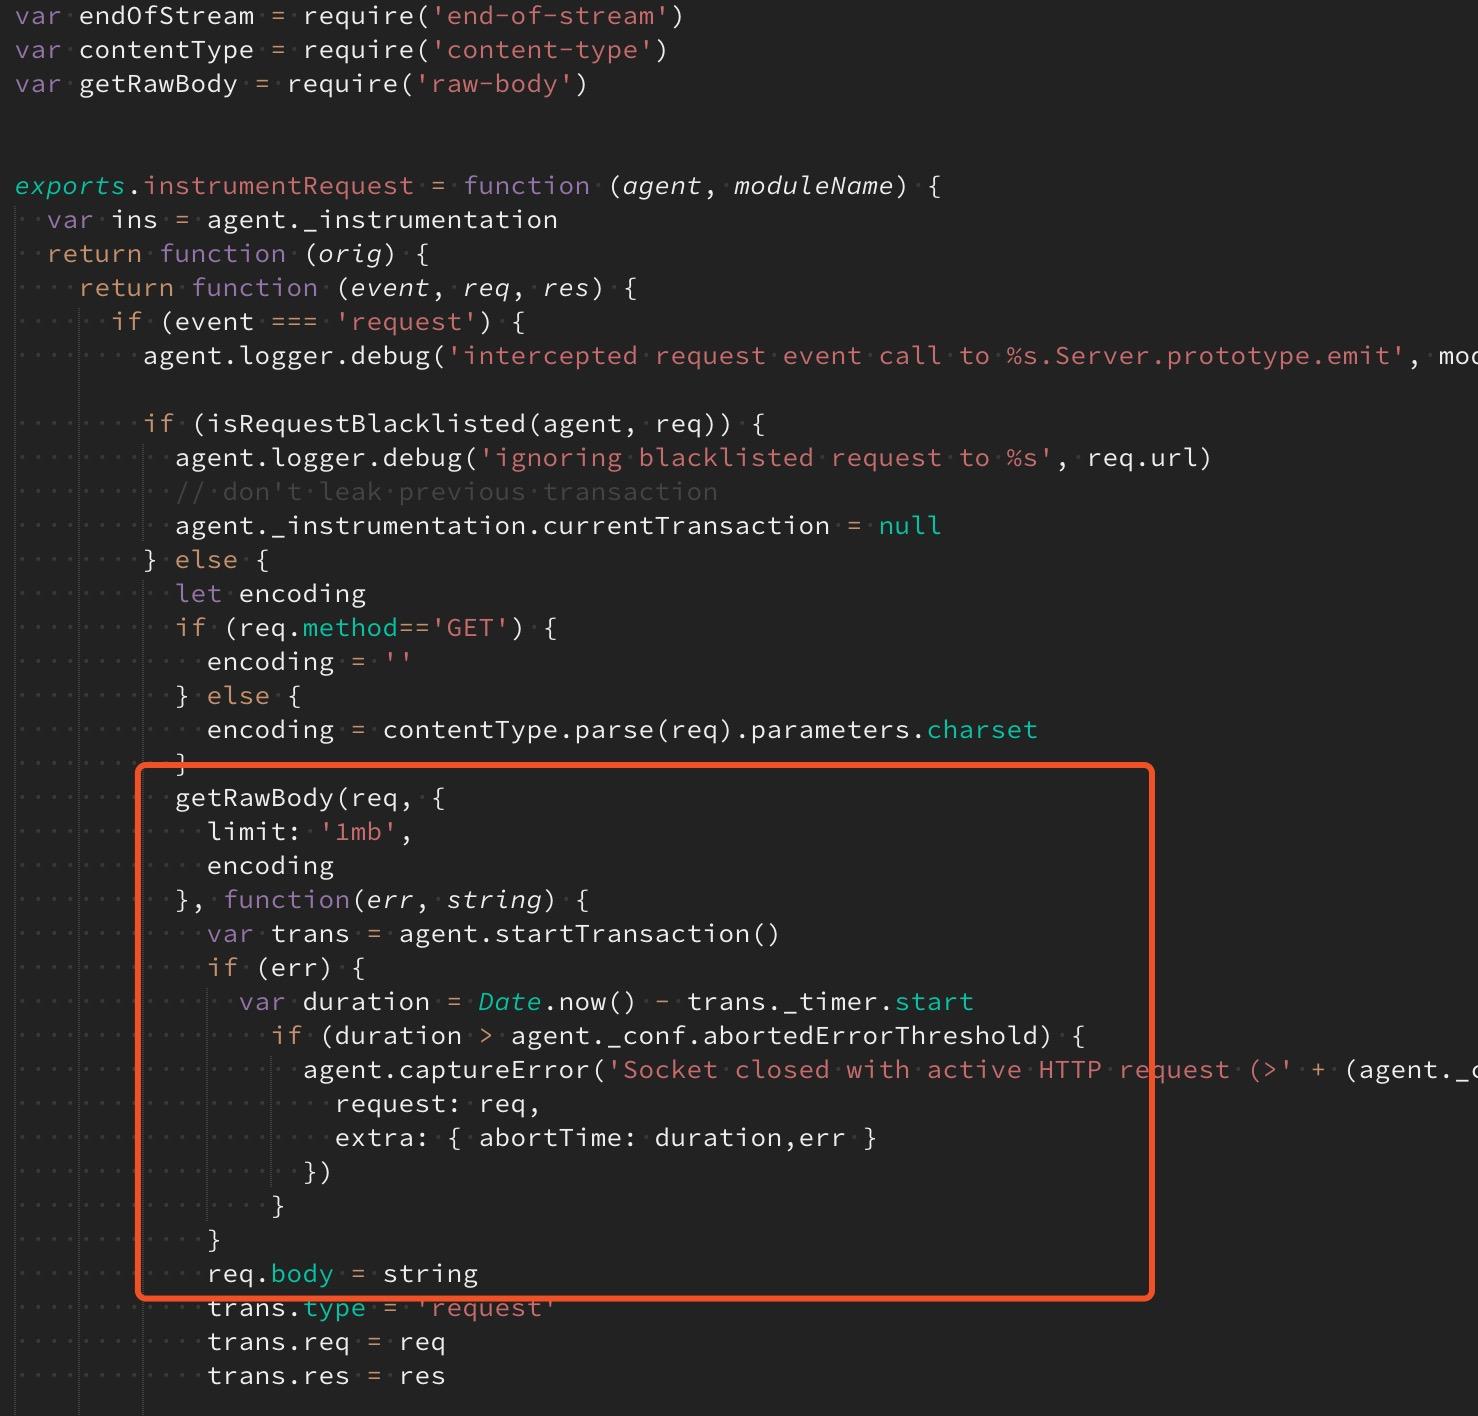 captureBody do not work · Issue #407 · elastic/apm-agent